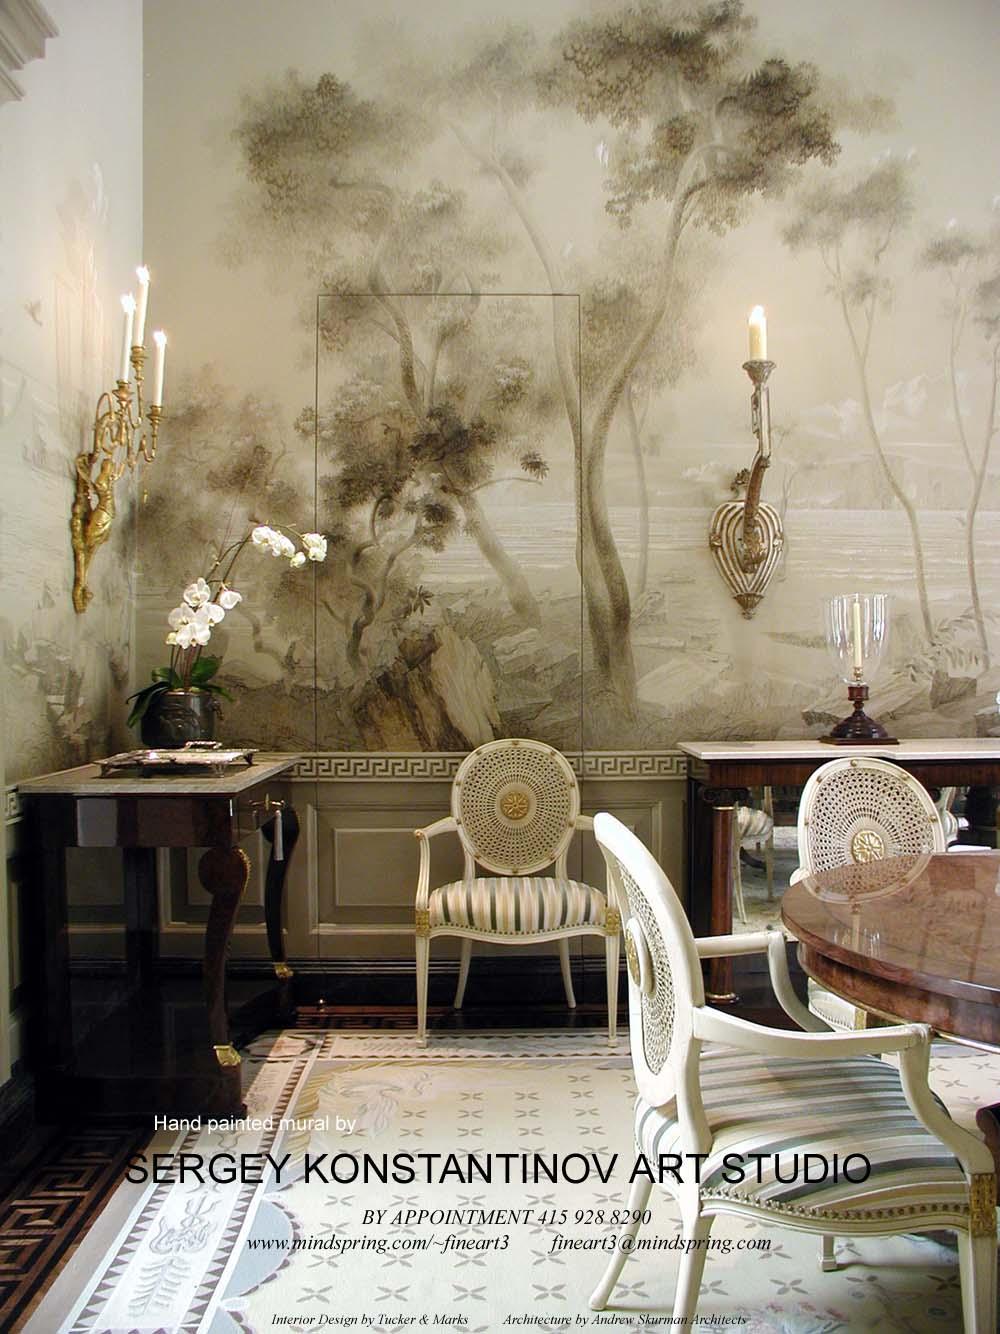 Interior Designer Suzanne Tucker.